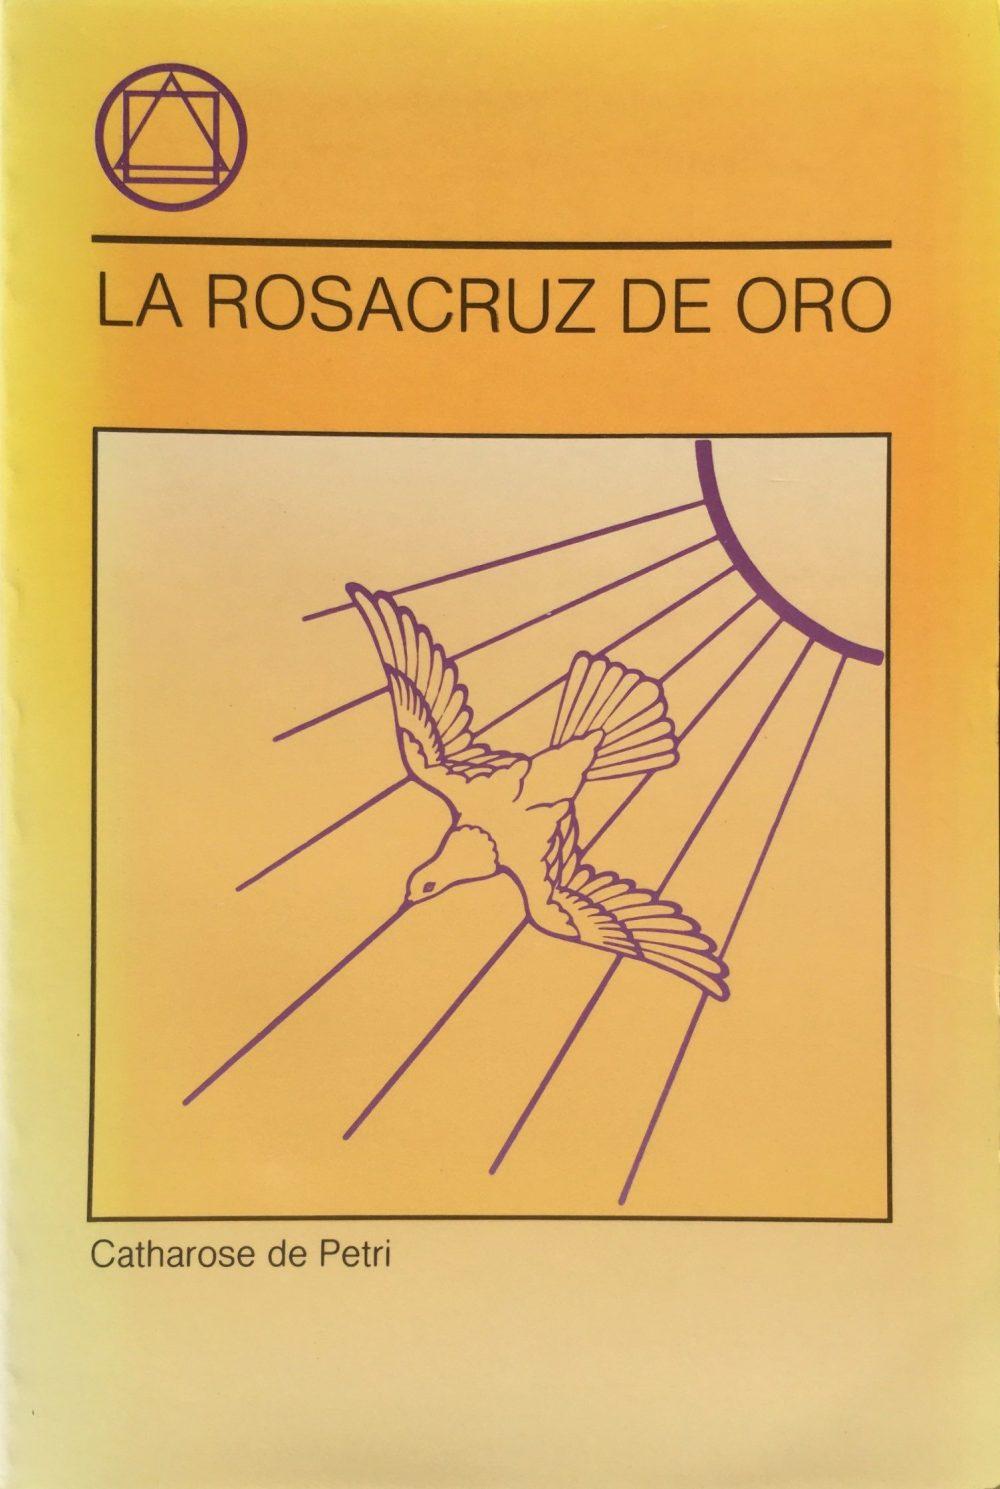 Portada Libro - La Rosacruz de Oro